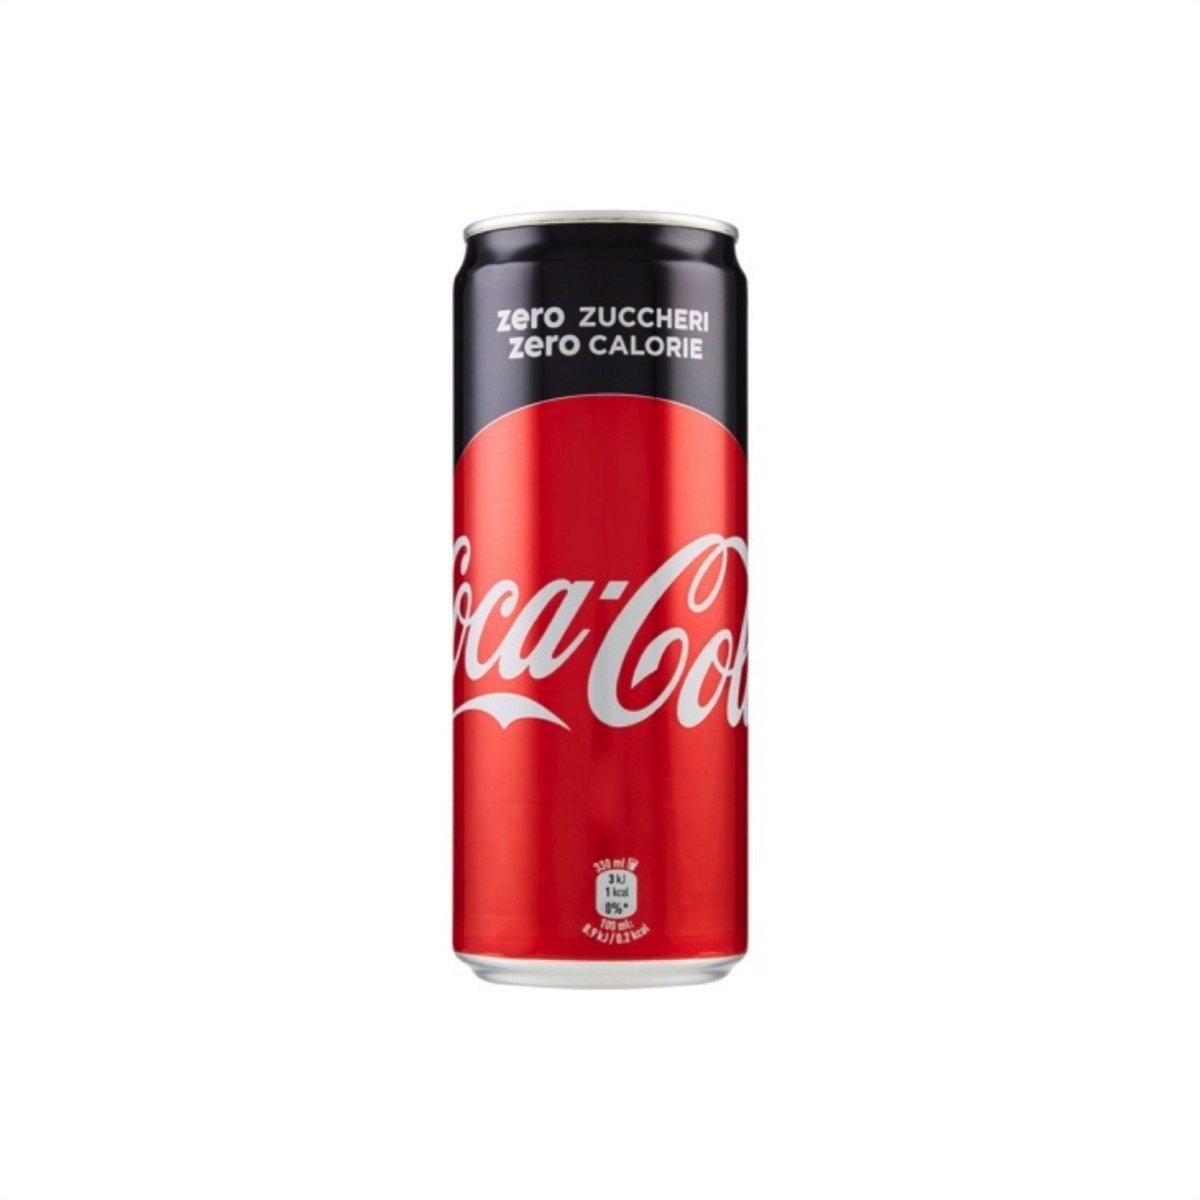 Coca ZERO [Lattina]